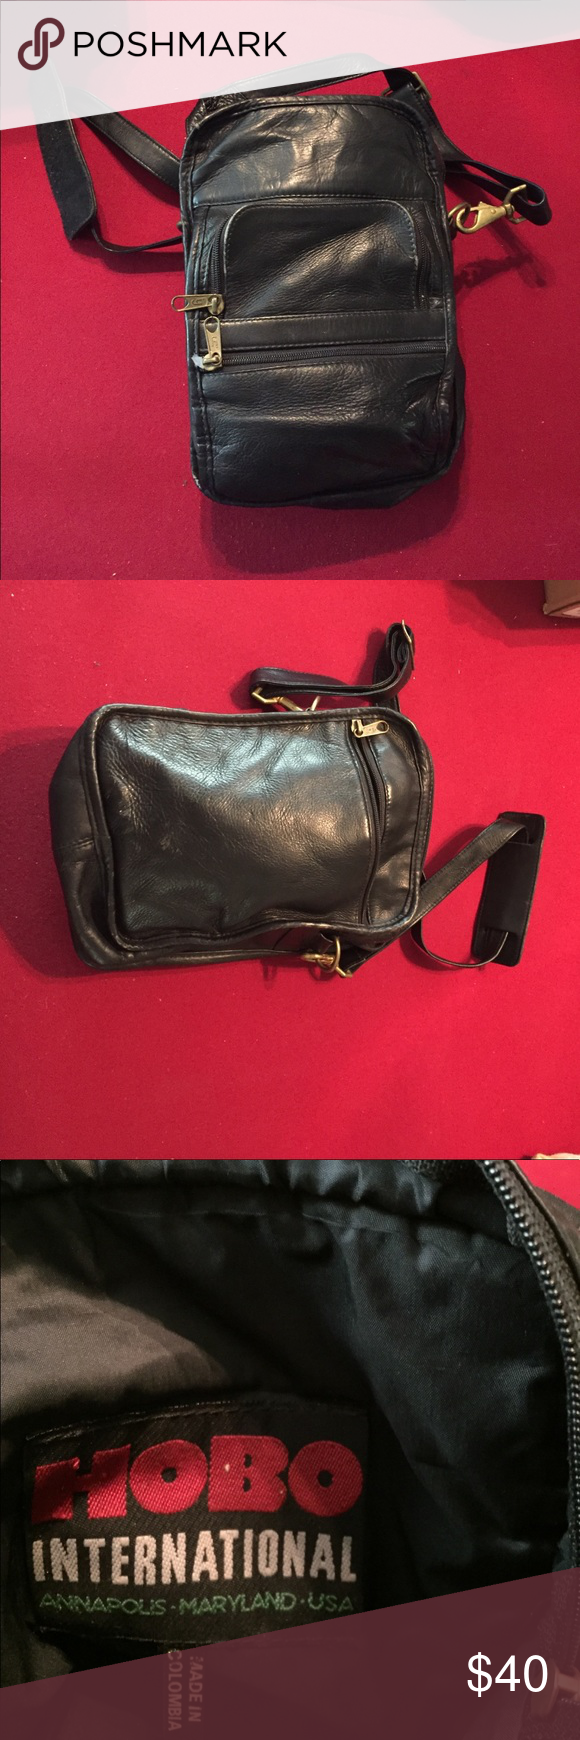 Hobo crossbody Purse Black calfskin messenger style bag